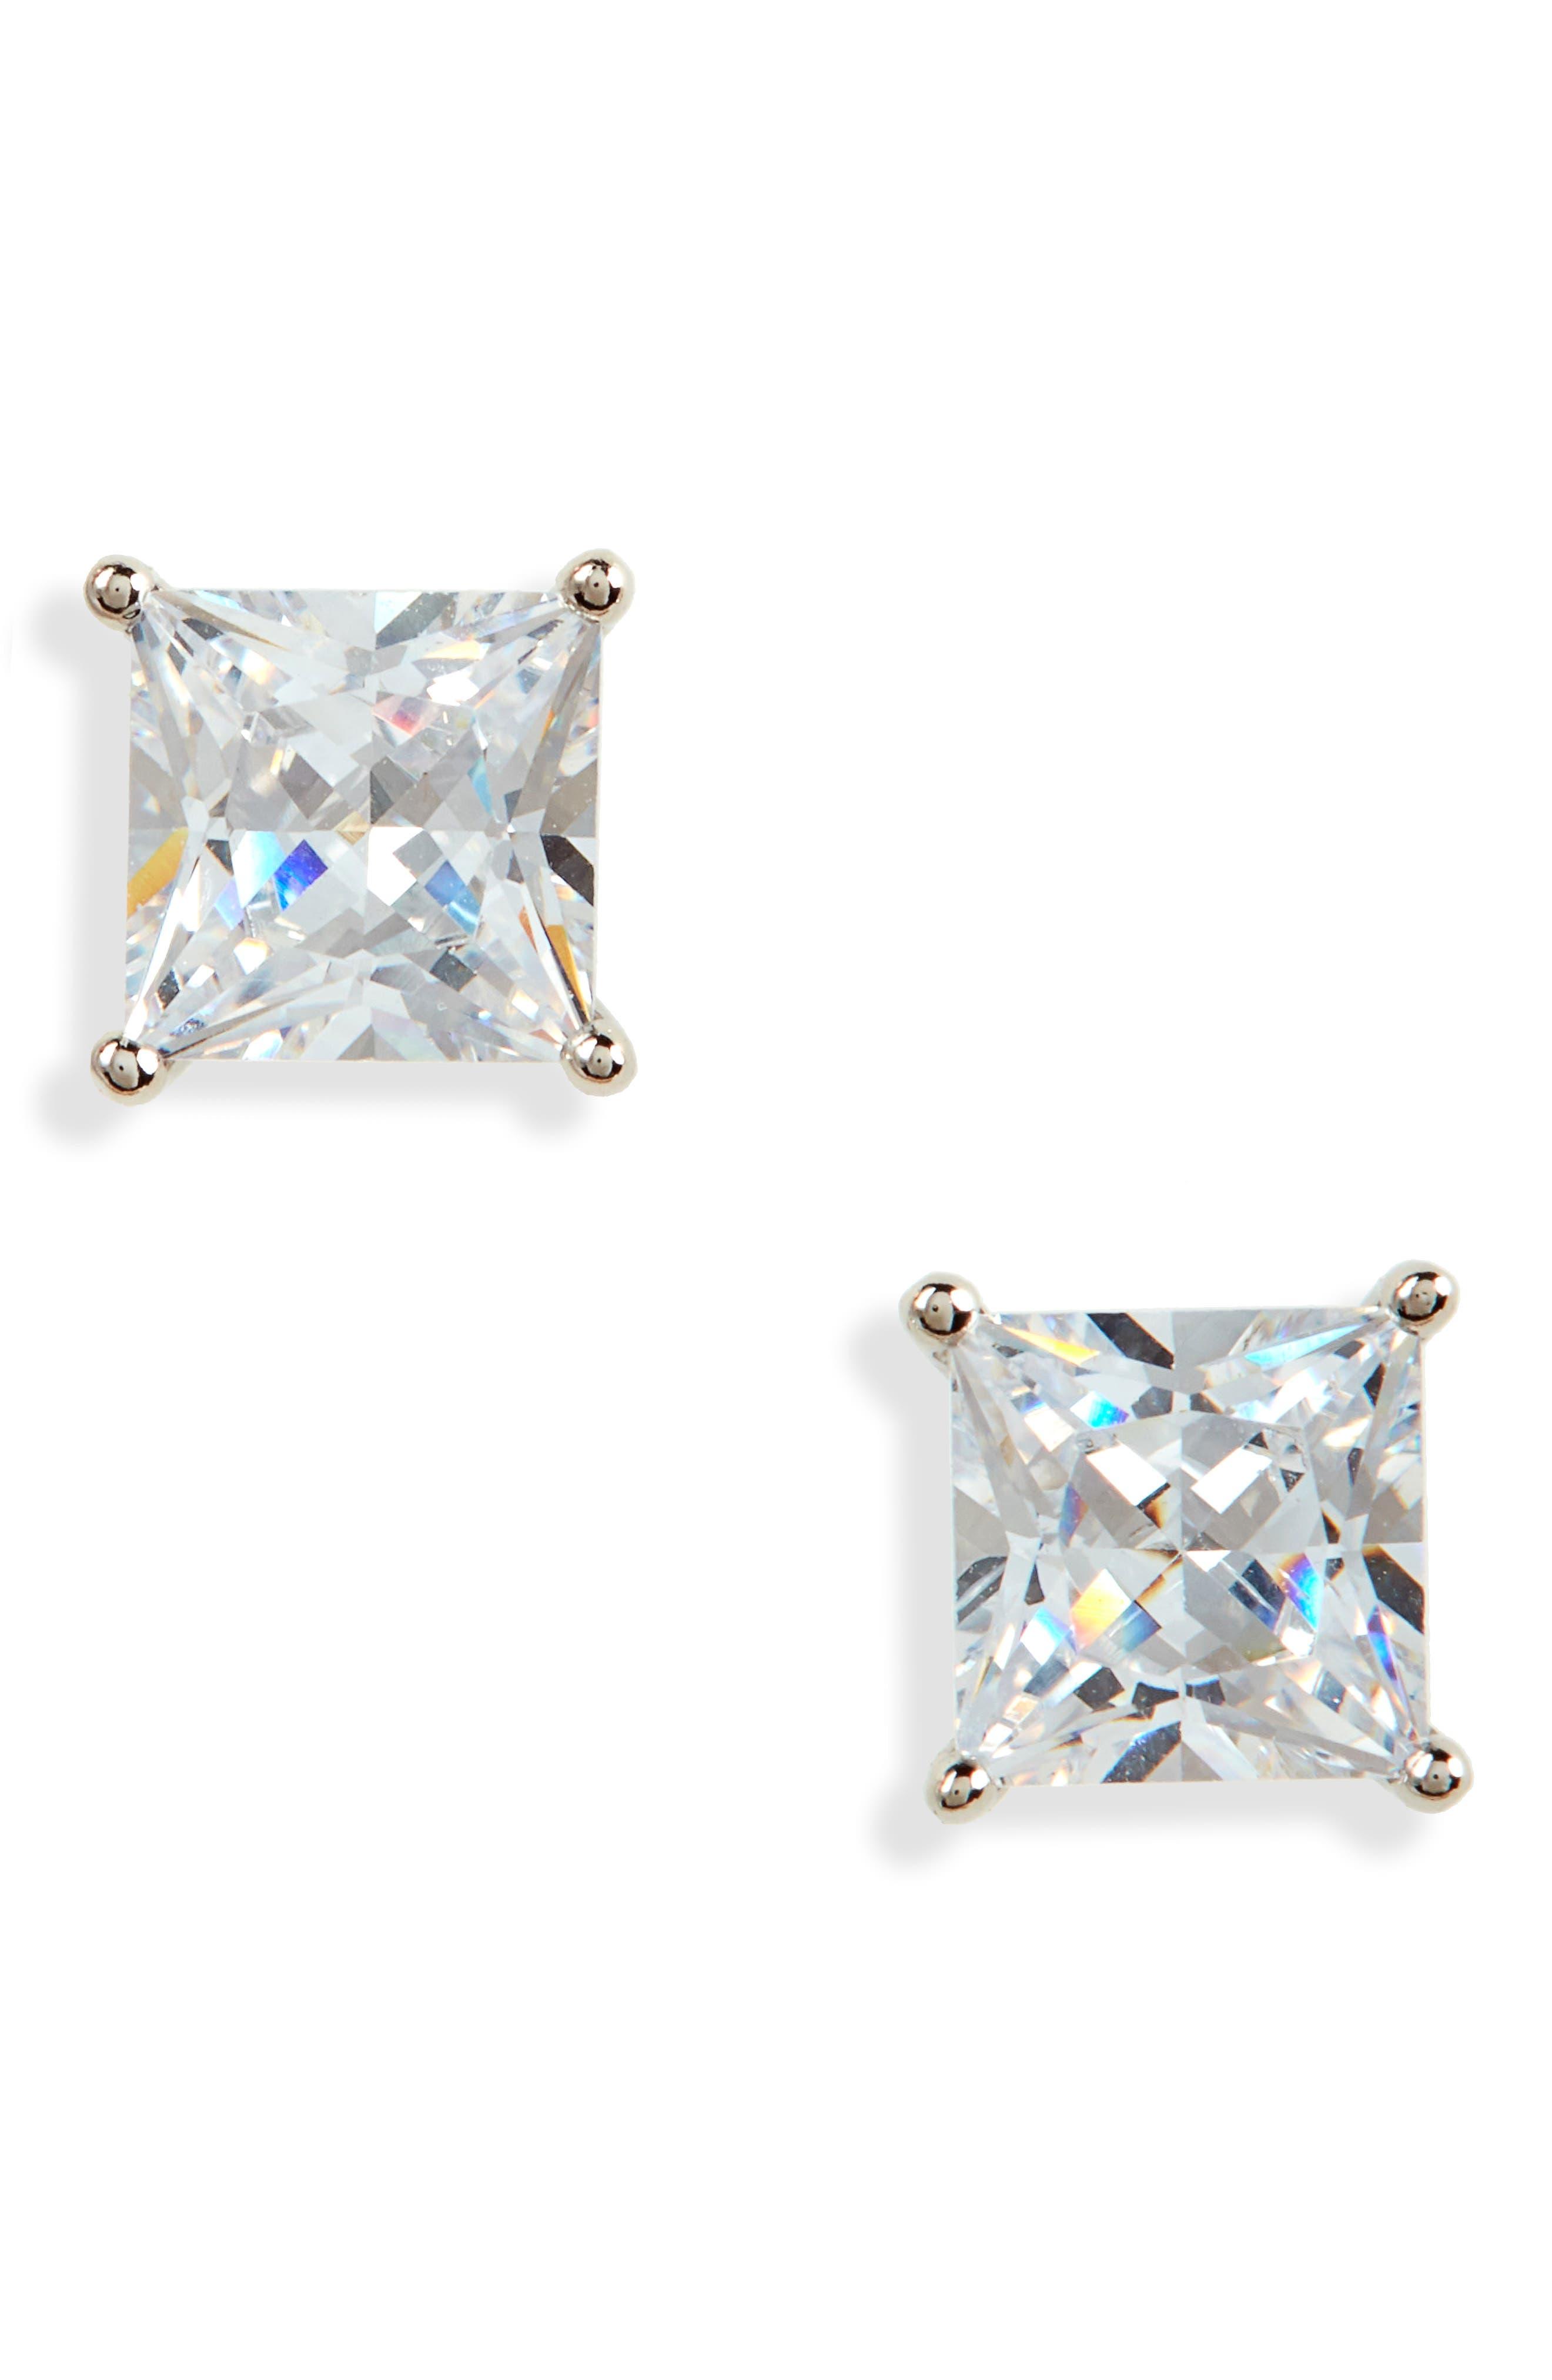 2ct tw Princess Cut Stud Earrings,                             Main thumbnail 1, color,